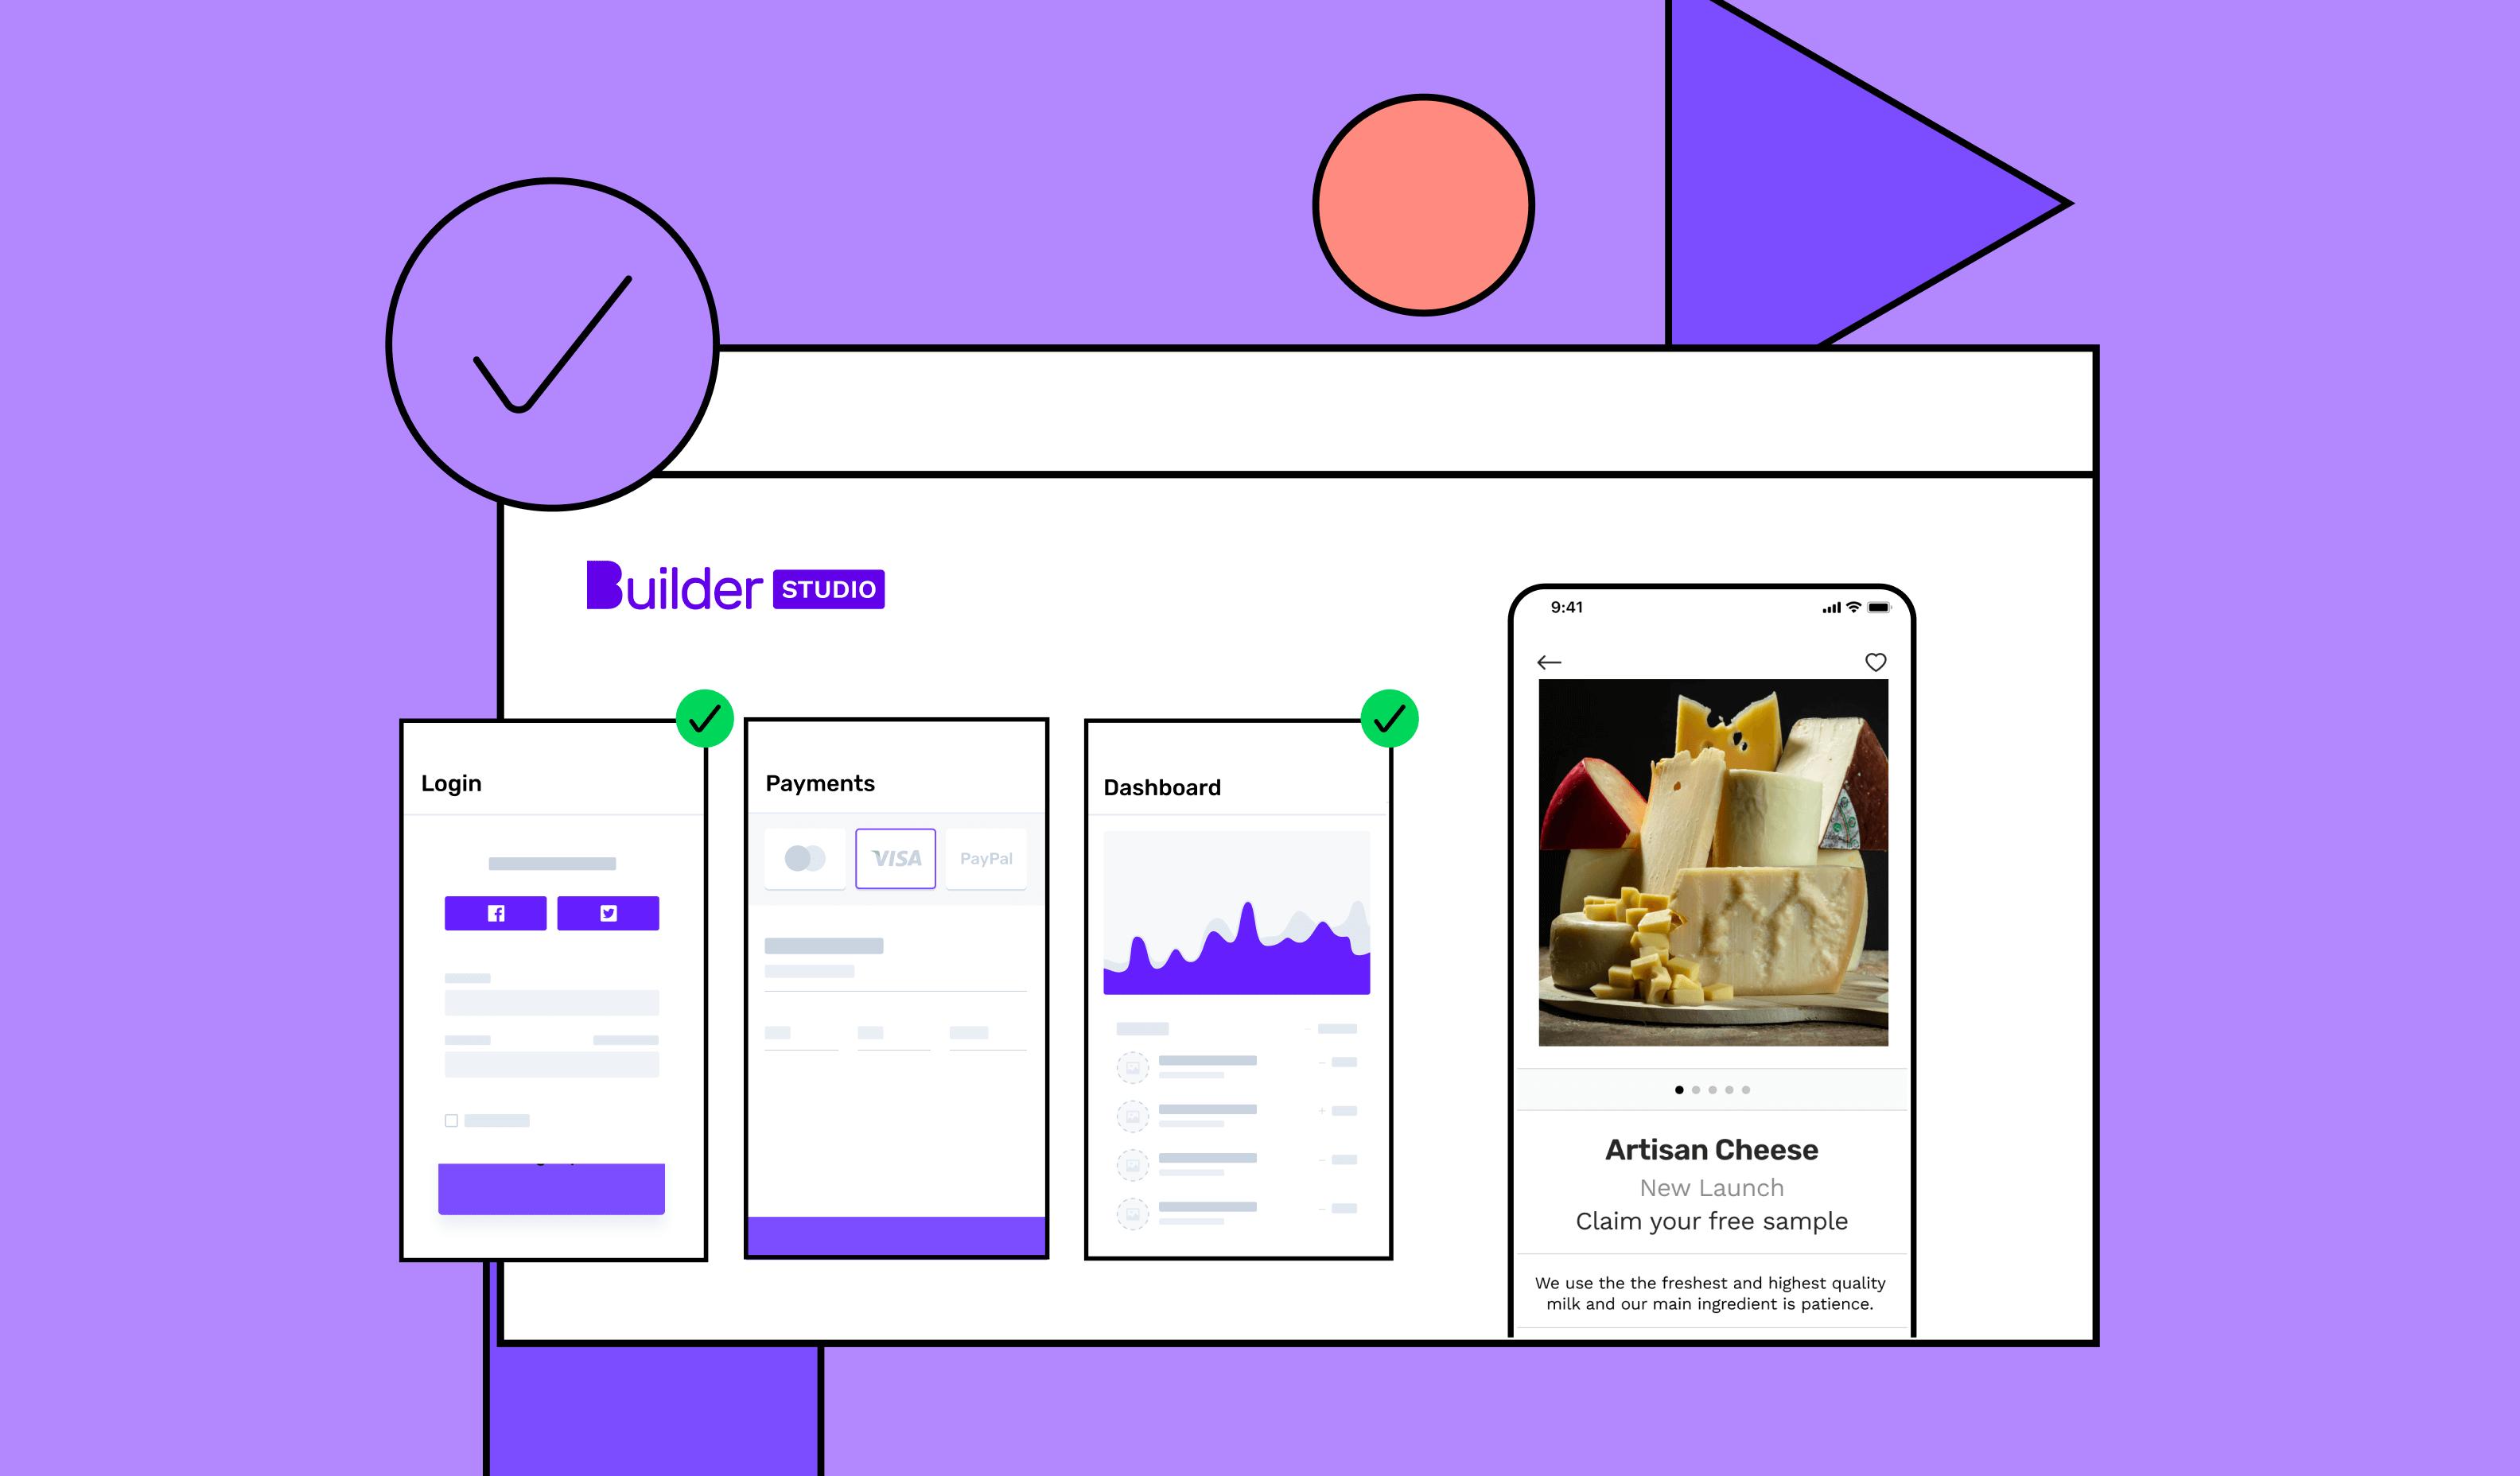 Building an app with Builder Studio, a no-code app builder